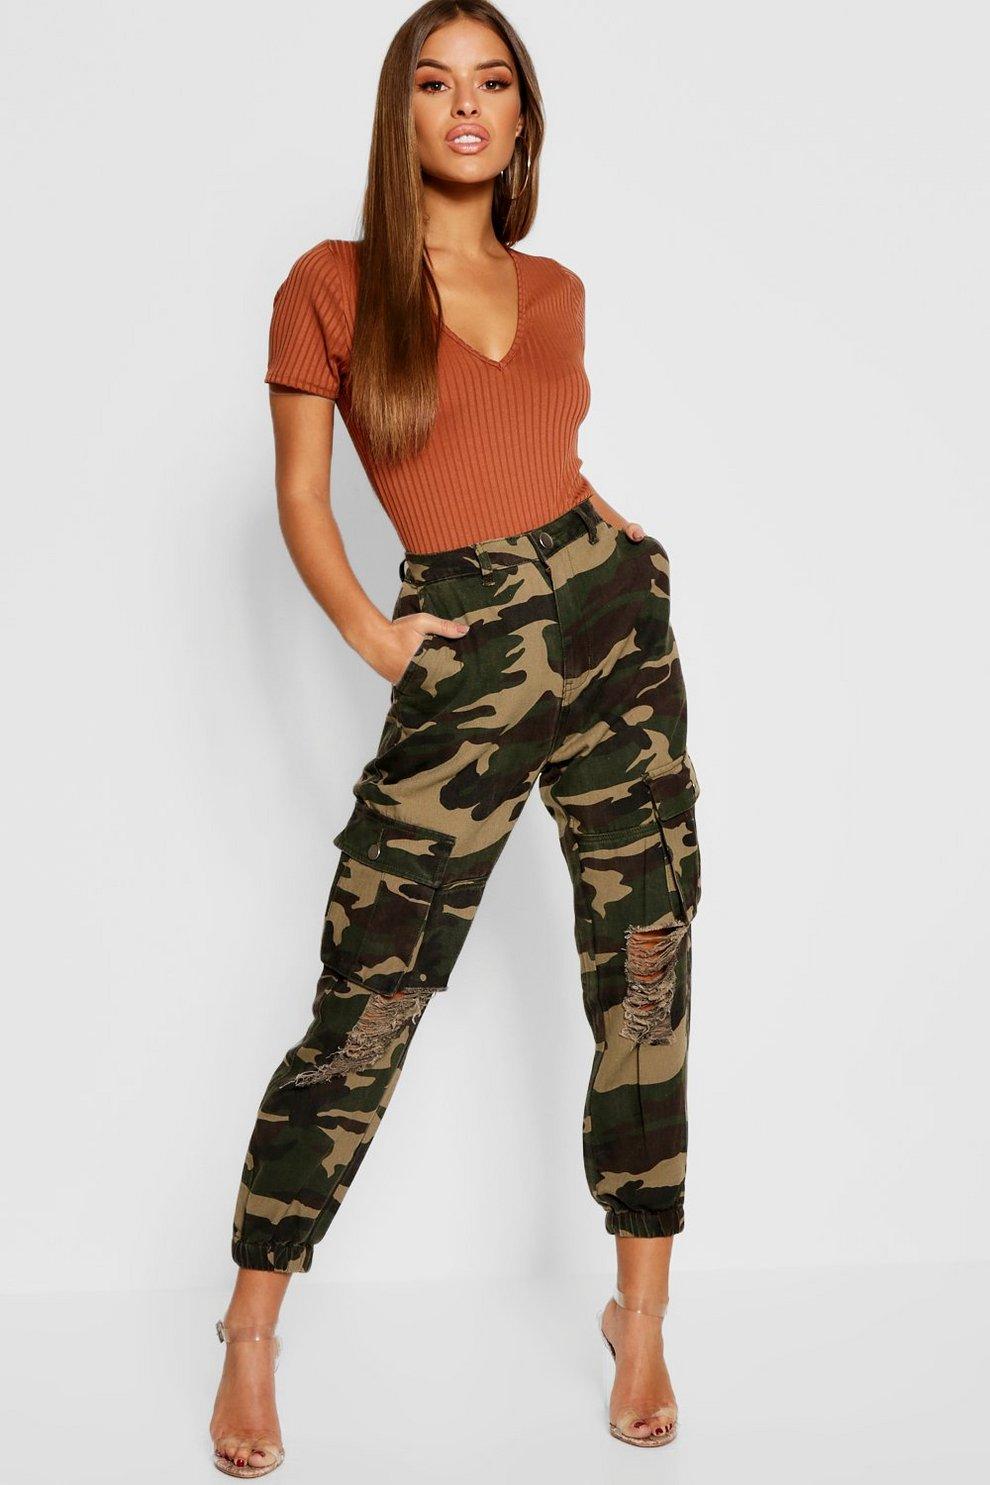 Petite Cargo Camouflage Boohoo Pantalon Pantalon Cargo Camouflage qnxwUCZaX